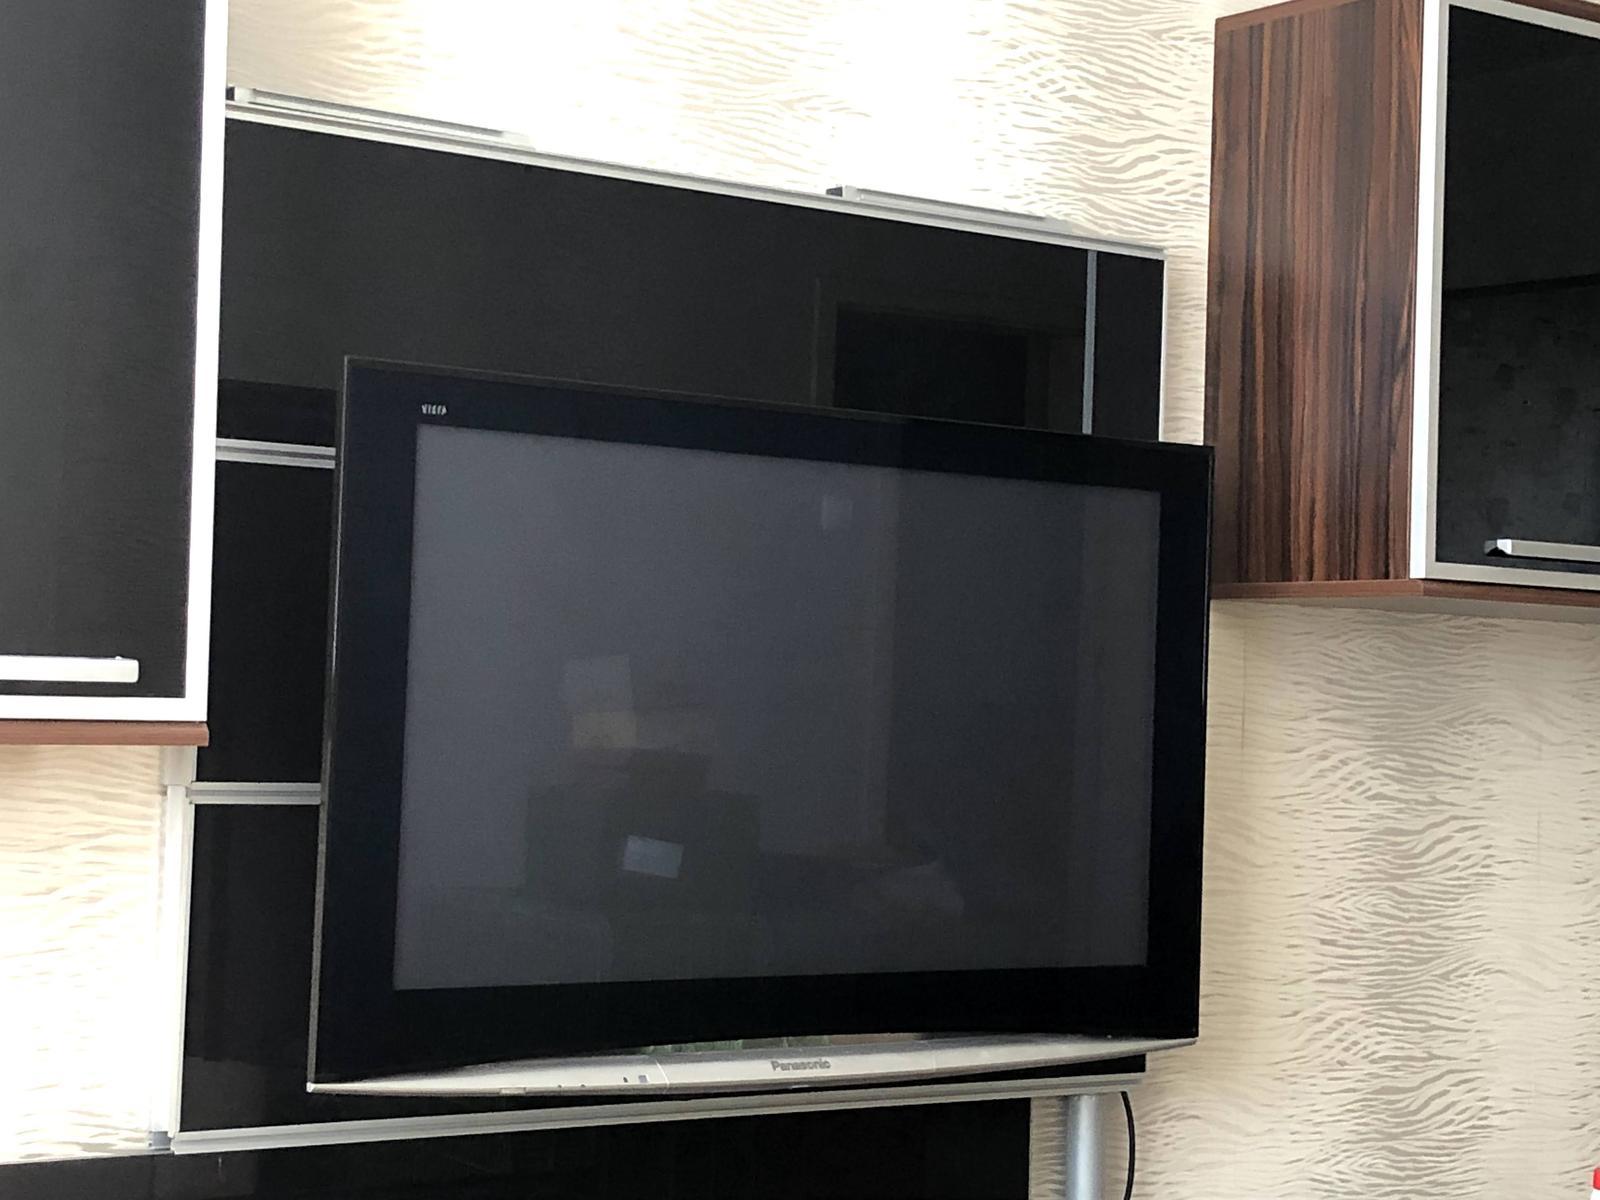 TV panasonic viera plazma full HD - Obrázok č. 1